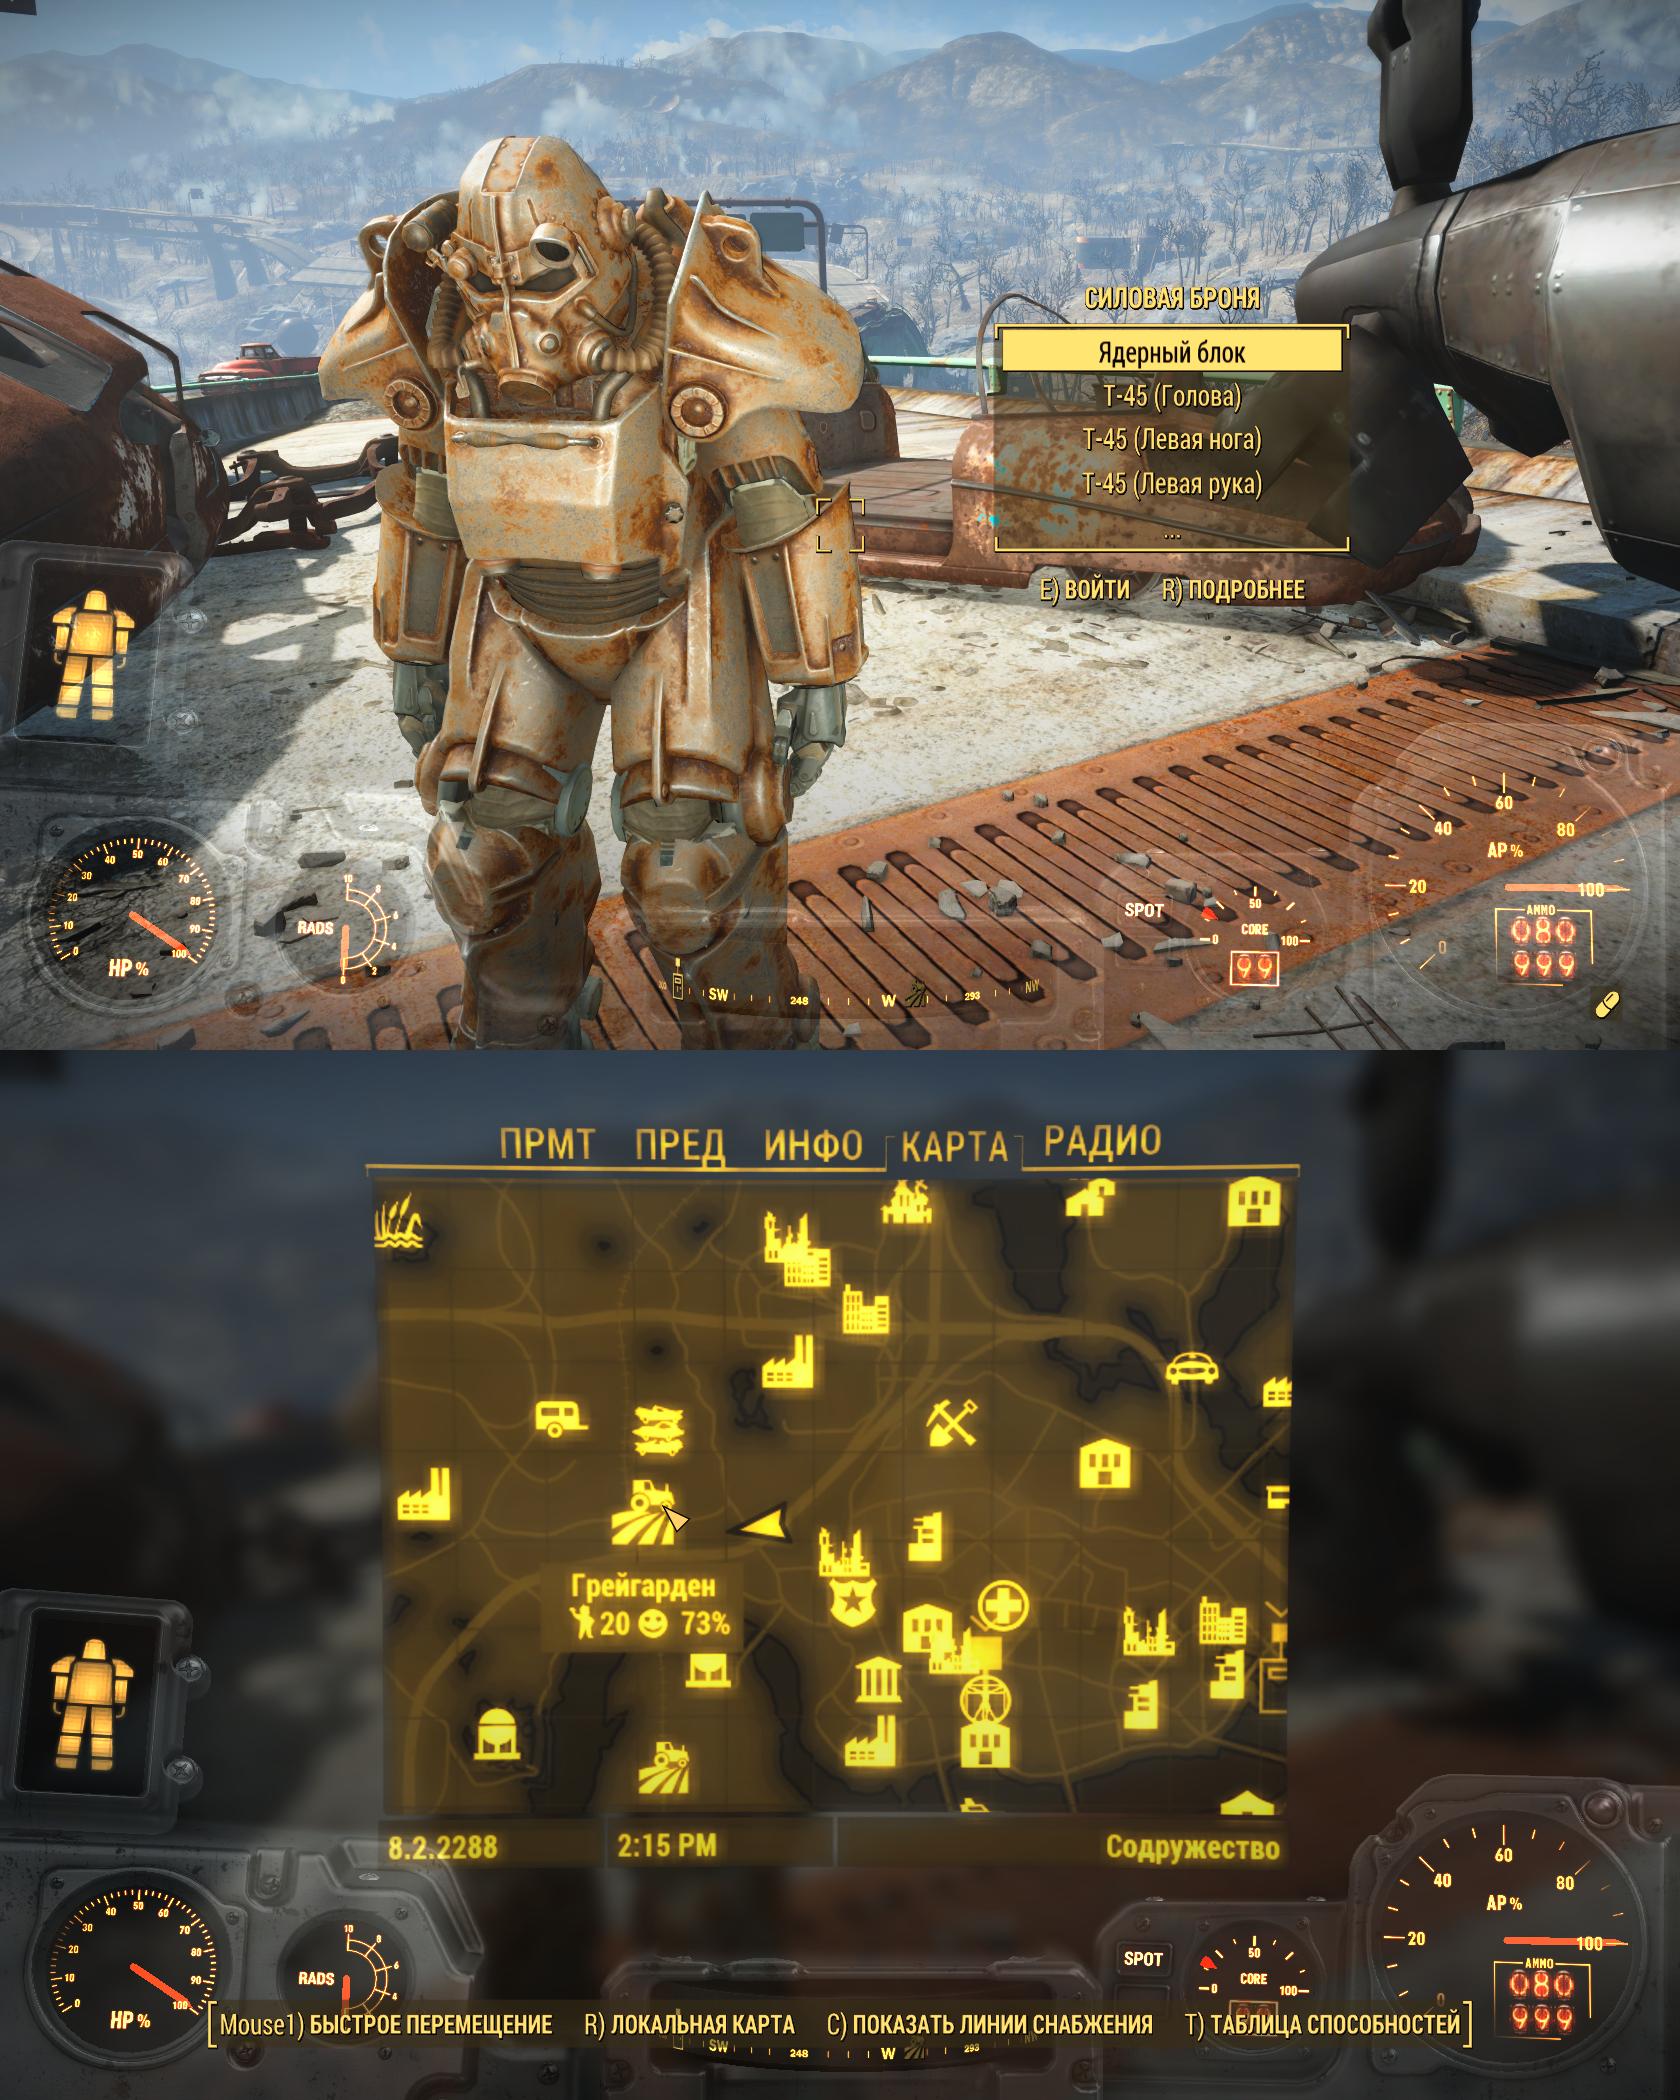 Броня (Грейгарден, восточнее, на эстакаде) - Fallout 4 Броня, Грейгарден, Локация, Силовая, Силовая броня, эстакада